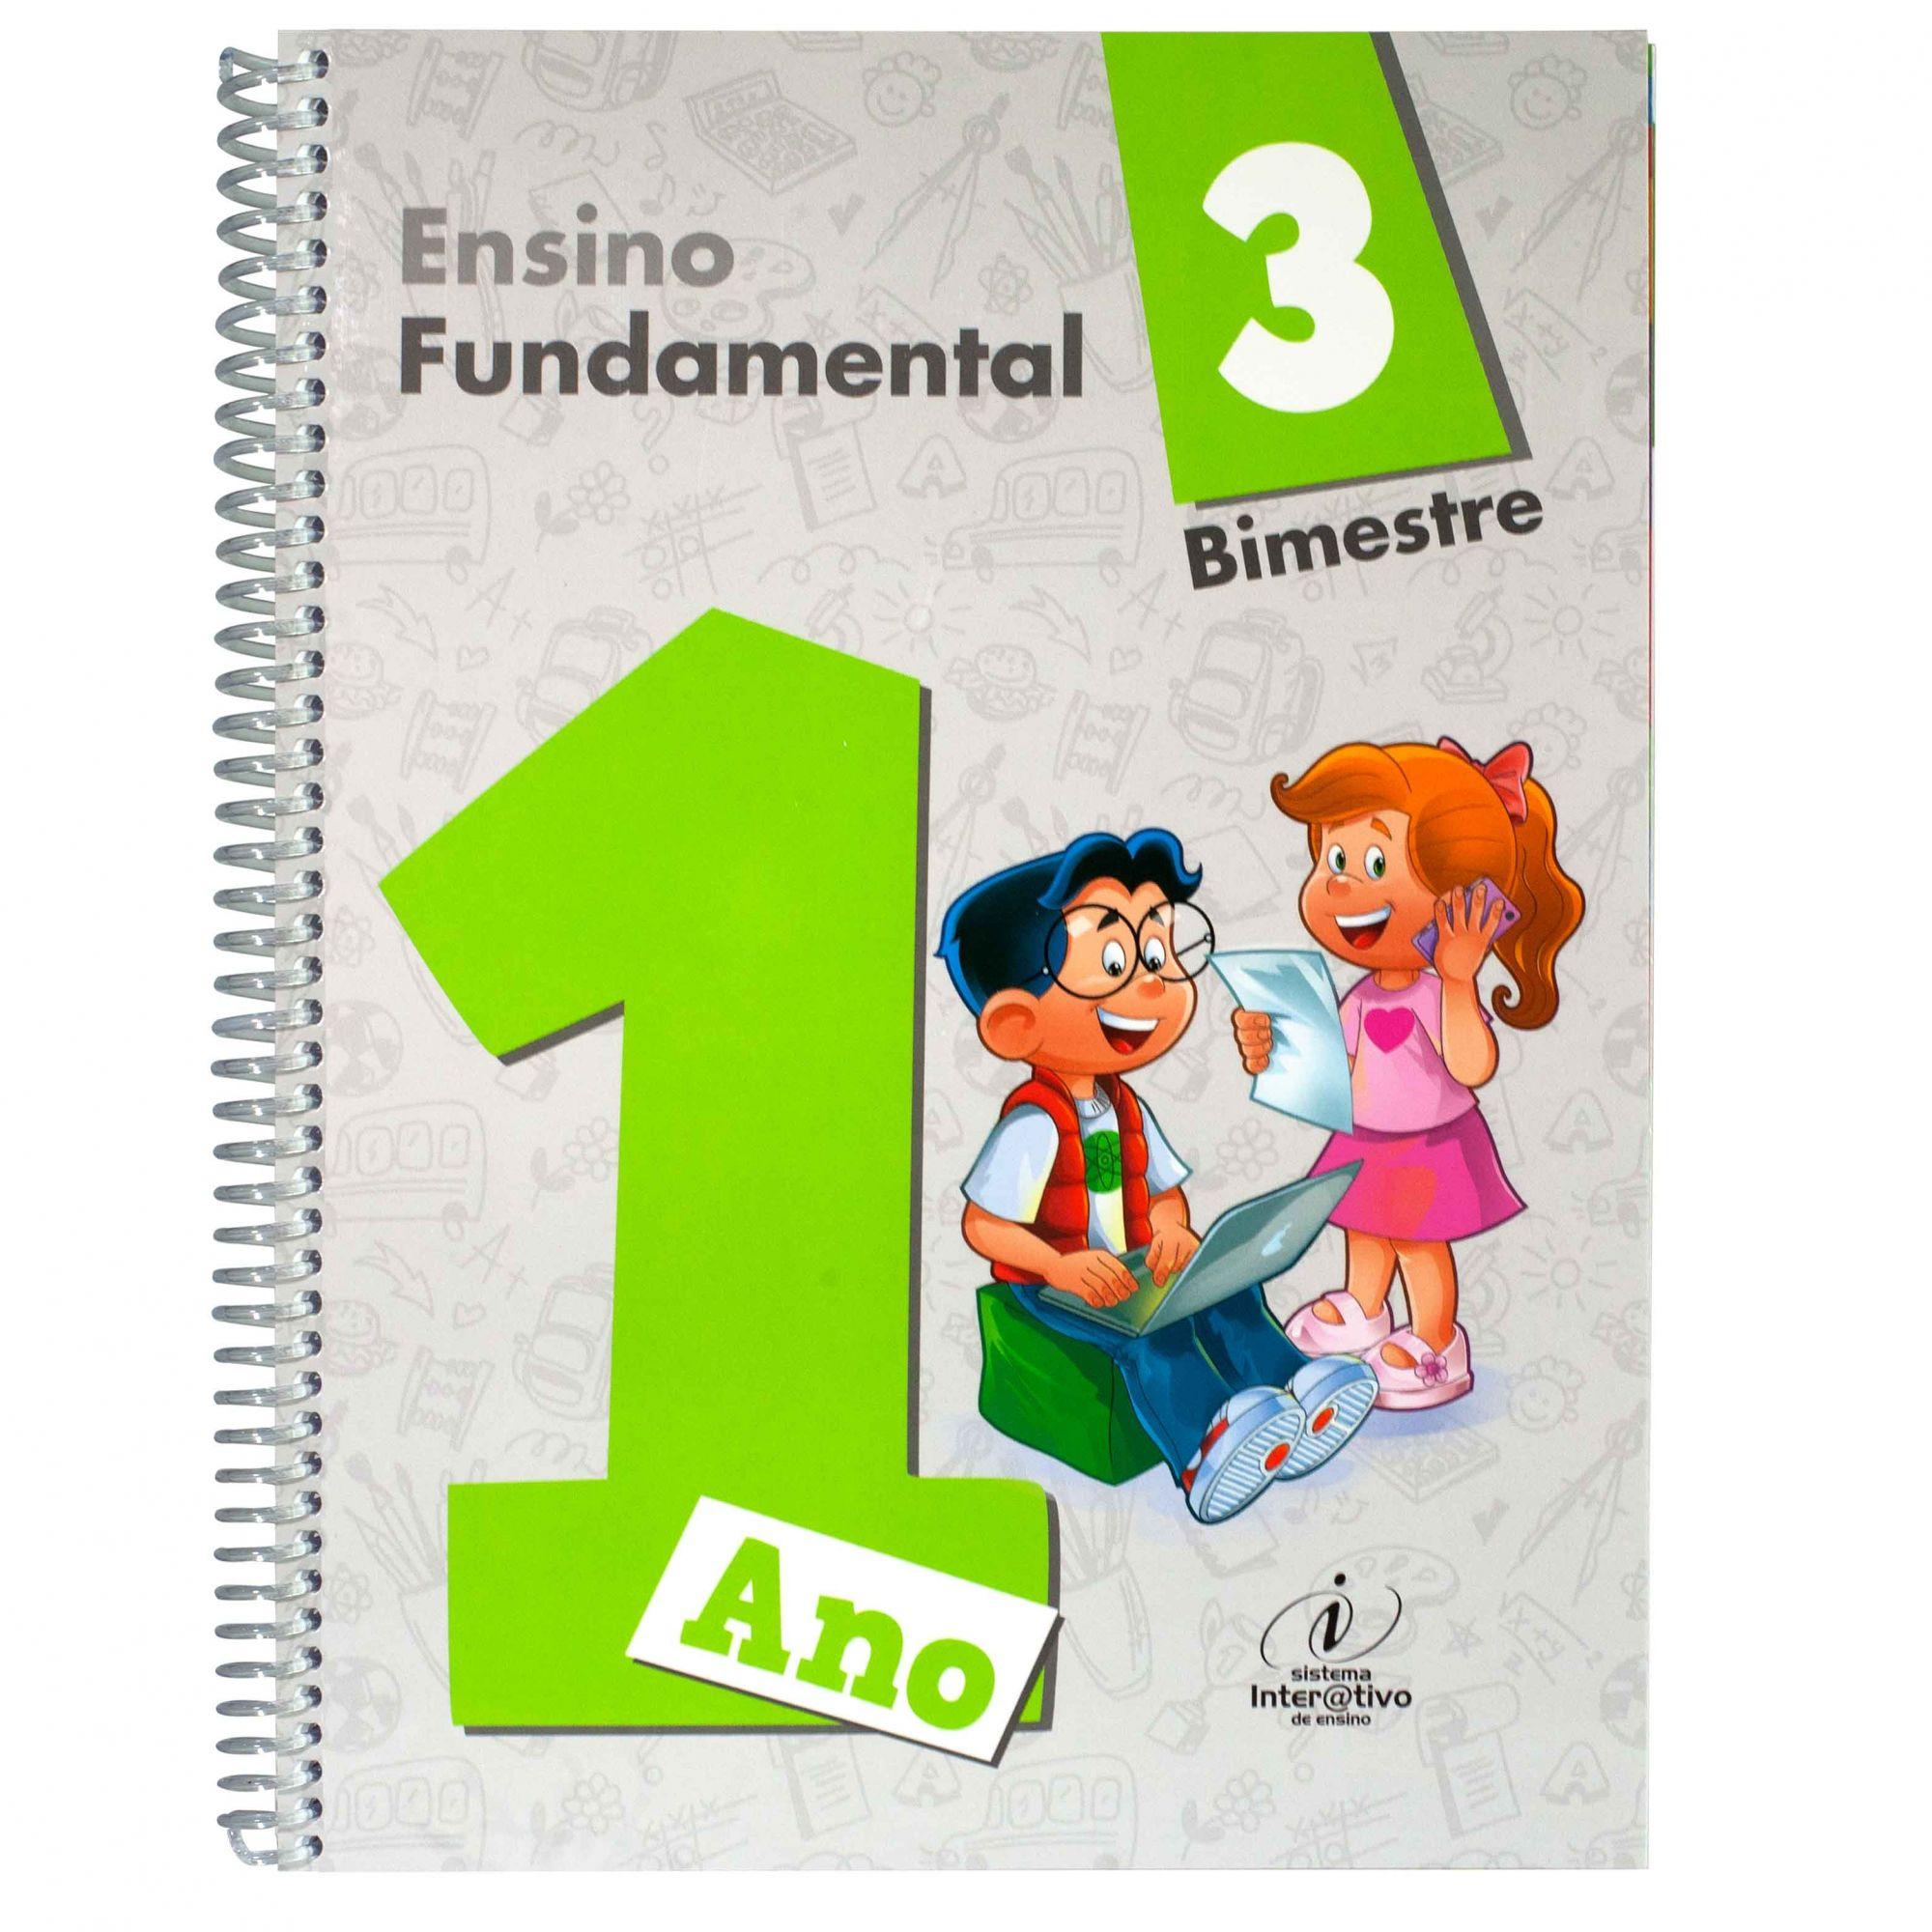 Sistema Interativo de Ensino 1º Ano   1º Semestre e 2º Semestre